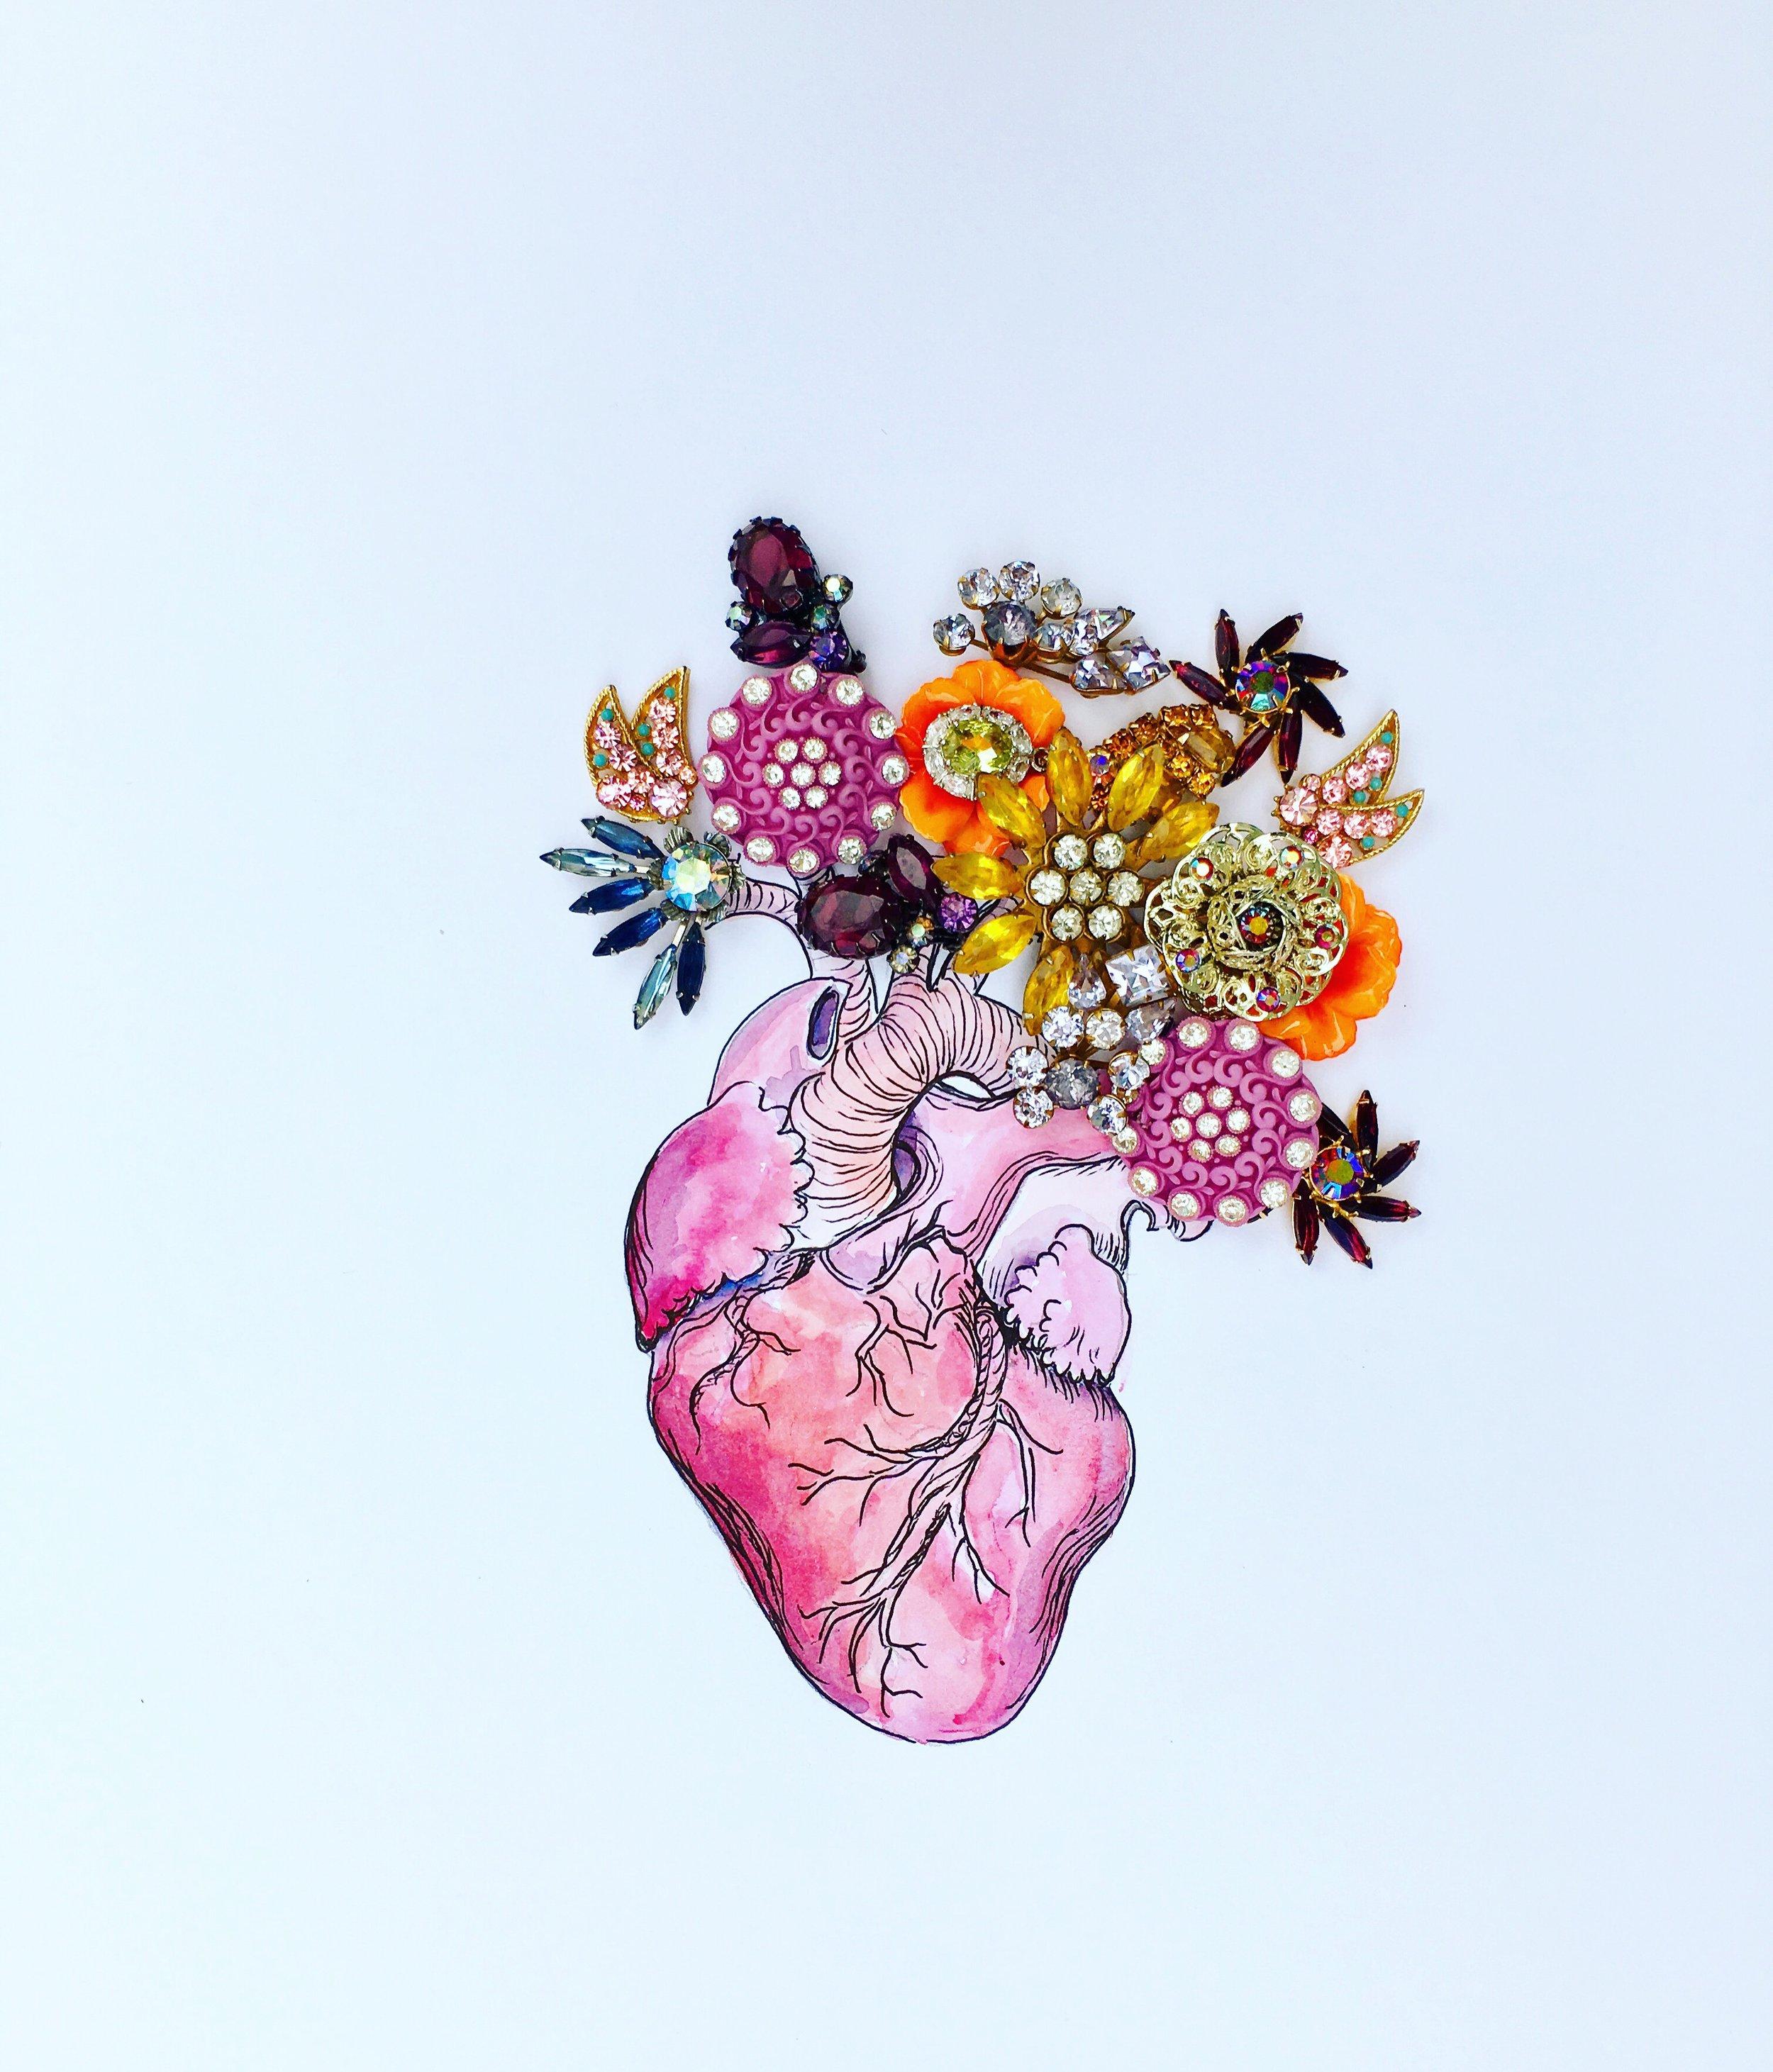 essential heart_ChristineHilbert.JPG